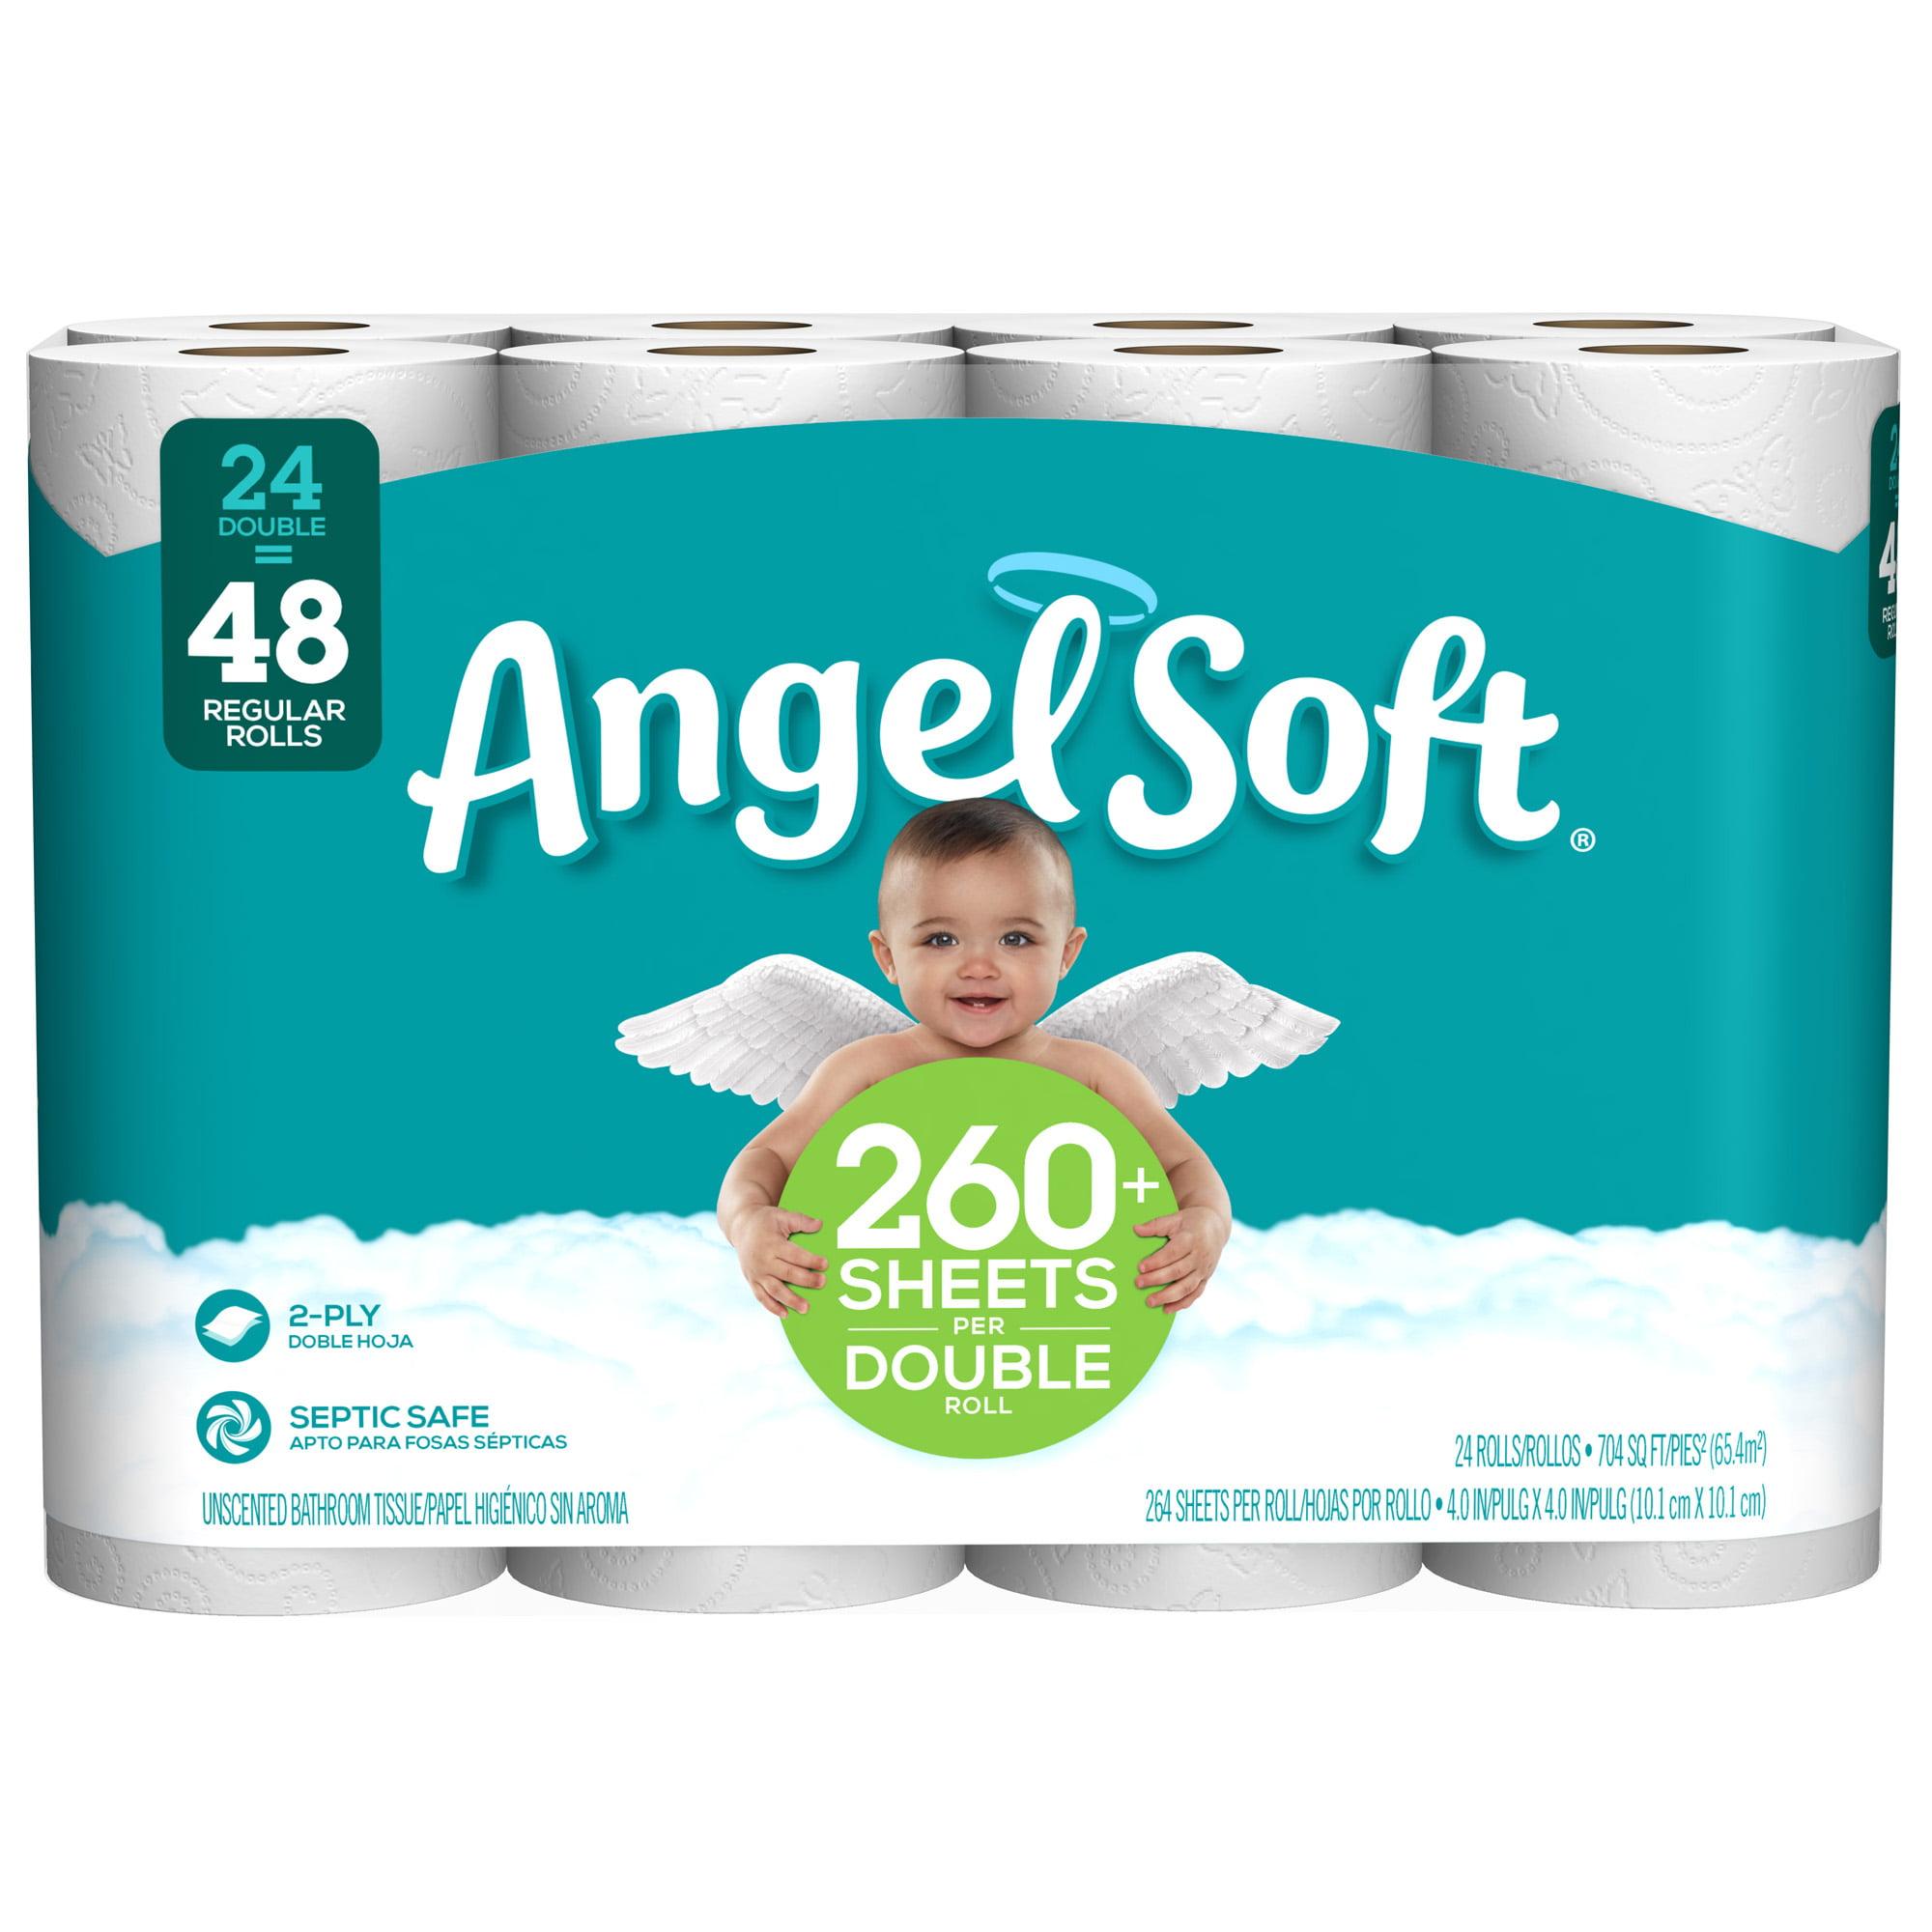 Angel Soft Toilet Paper 24 Double Rolls Walmart Com